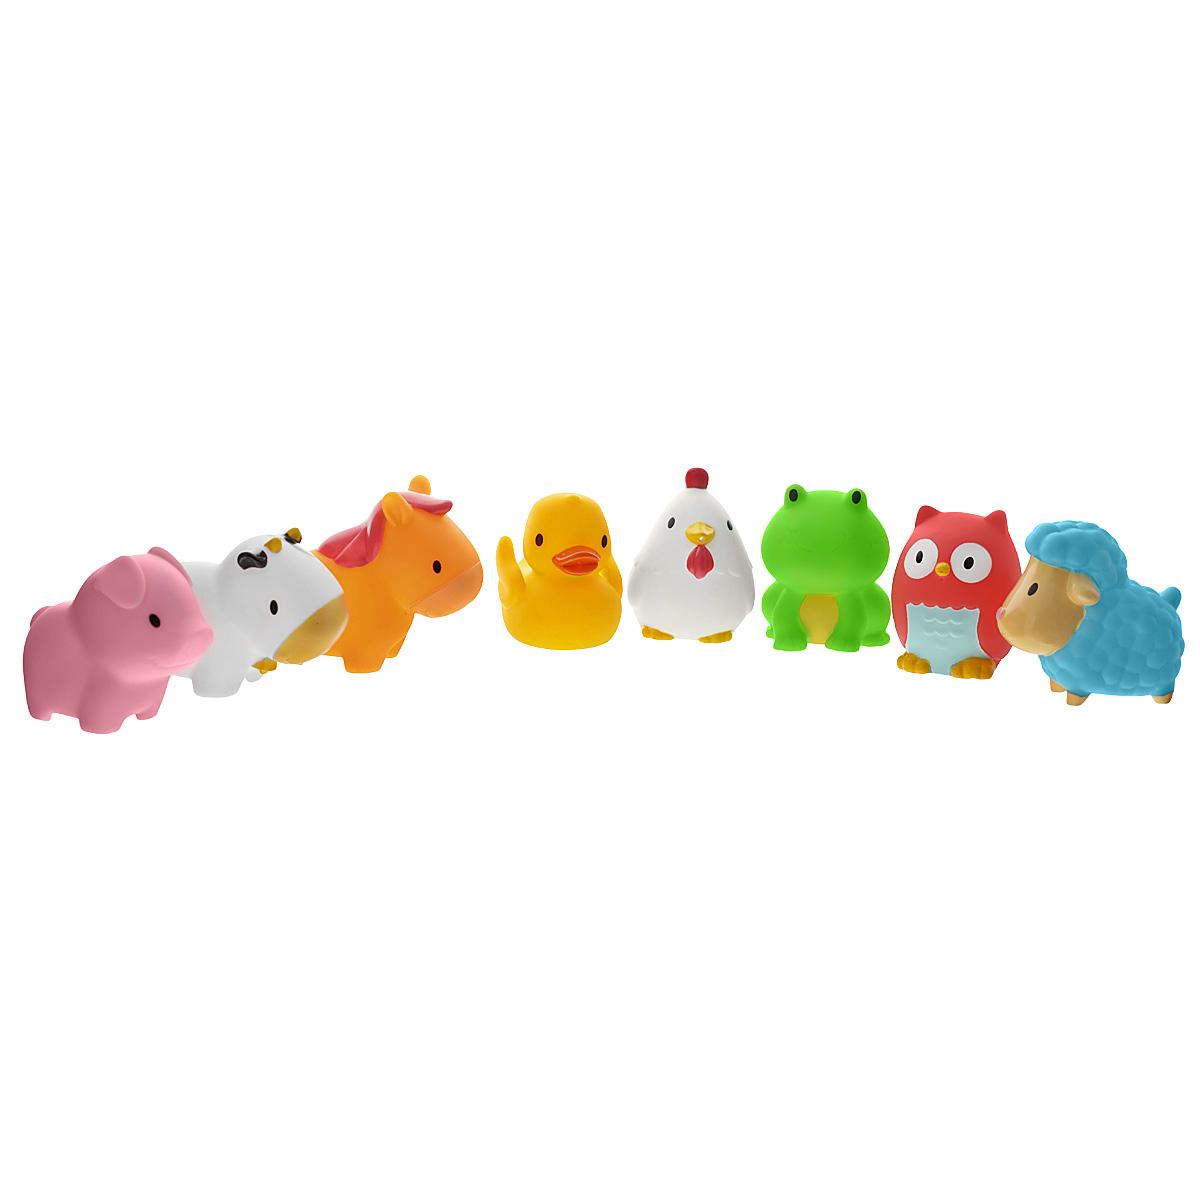 "Набор игрушек для ванны Munchkin ""Squirtin' Farmyard Friends"", 8 шт"